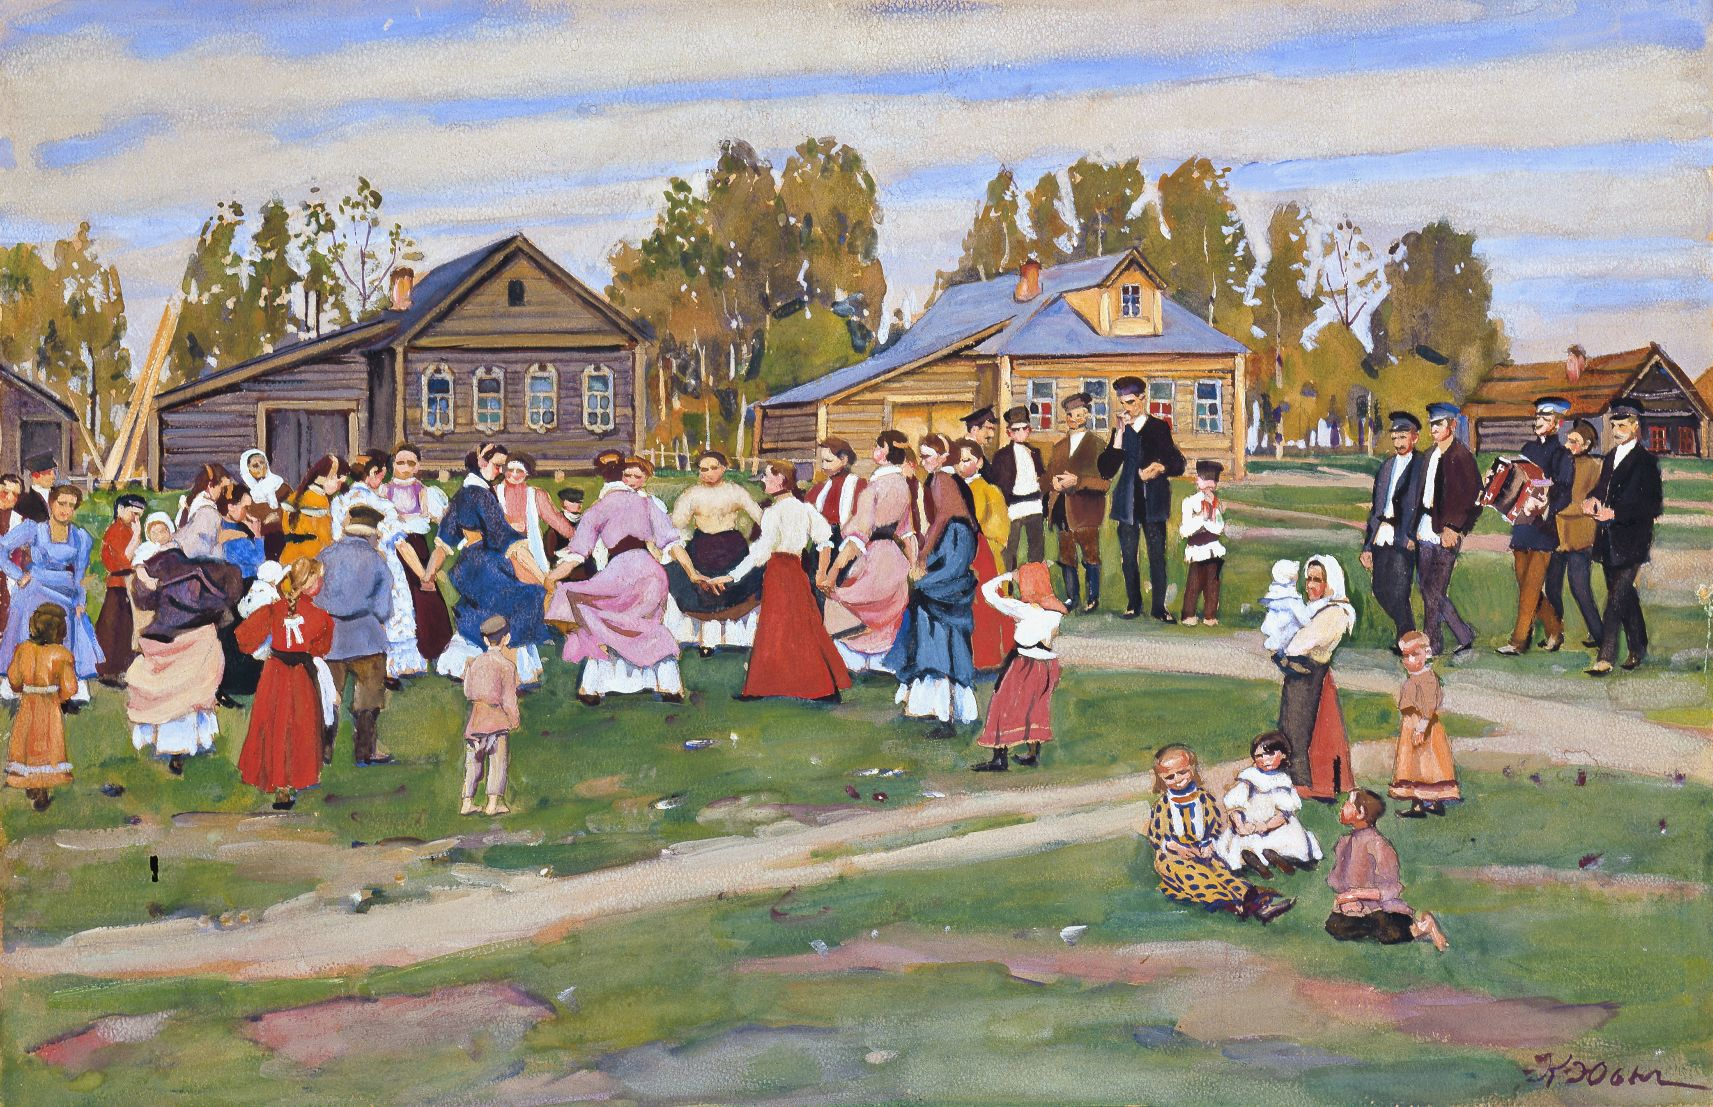 KONSTANTIN FJODOROWITSCH JUON (1875 Moskau 1958) - Dorffest, Aquarell u. Gouache/Papier/Karton, signiert